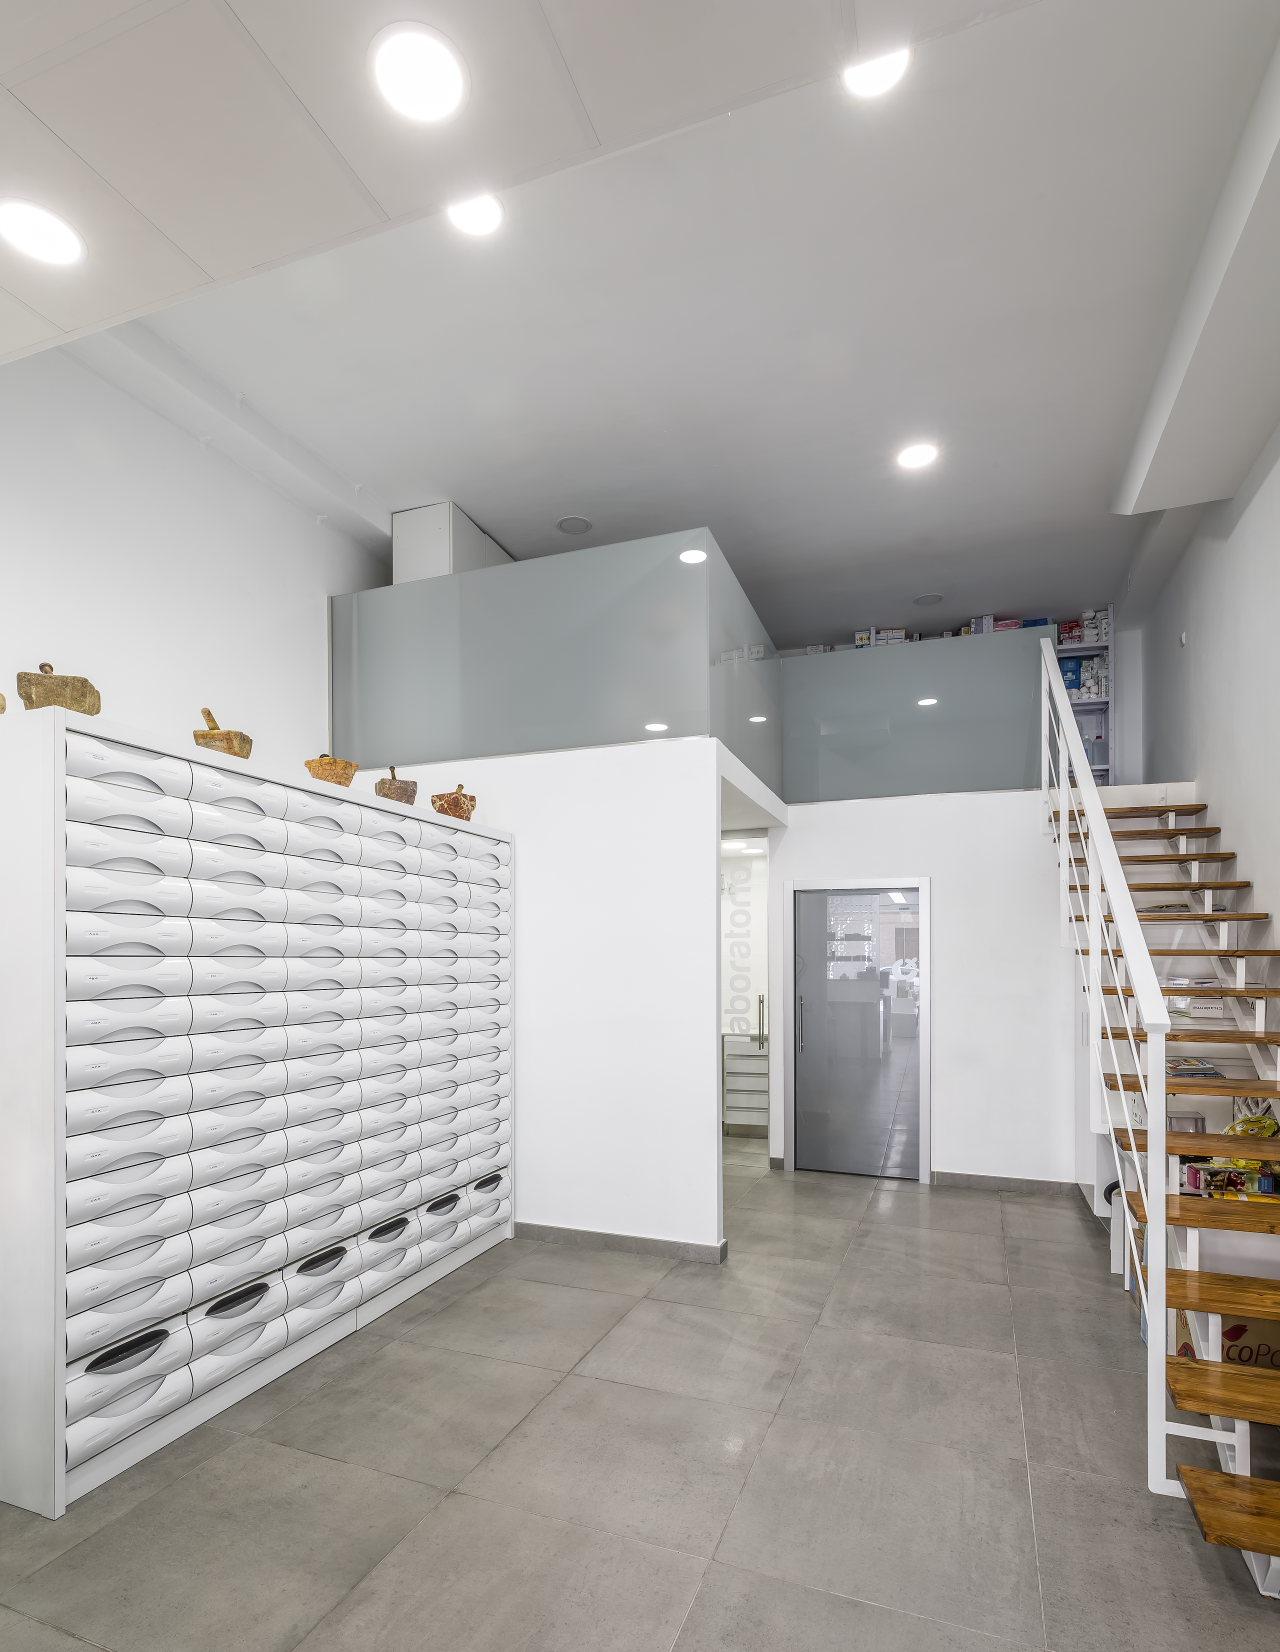 fotografia-arquitectura-valencia-german-cabo-d'estudio-farmacia-arenos-almassora-castellon (16)